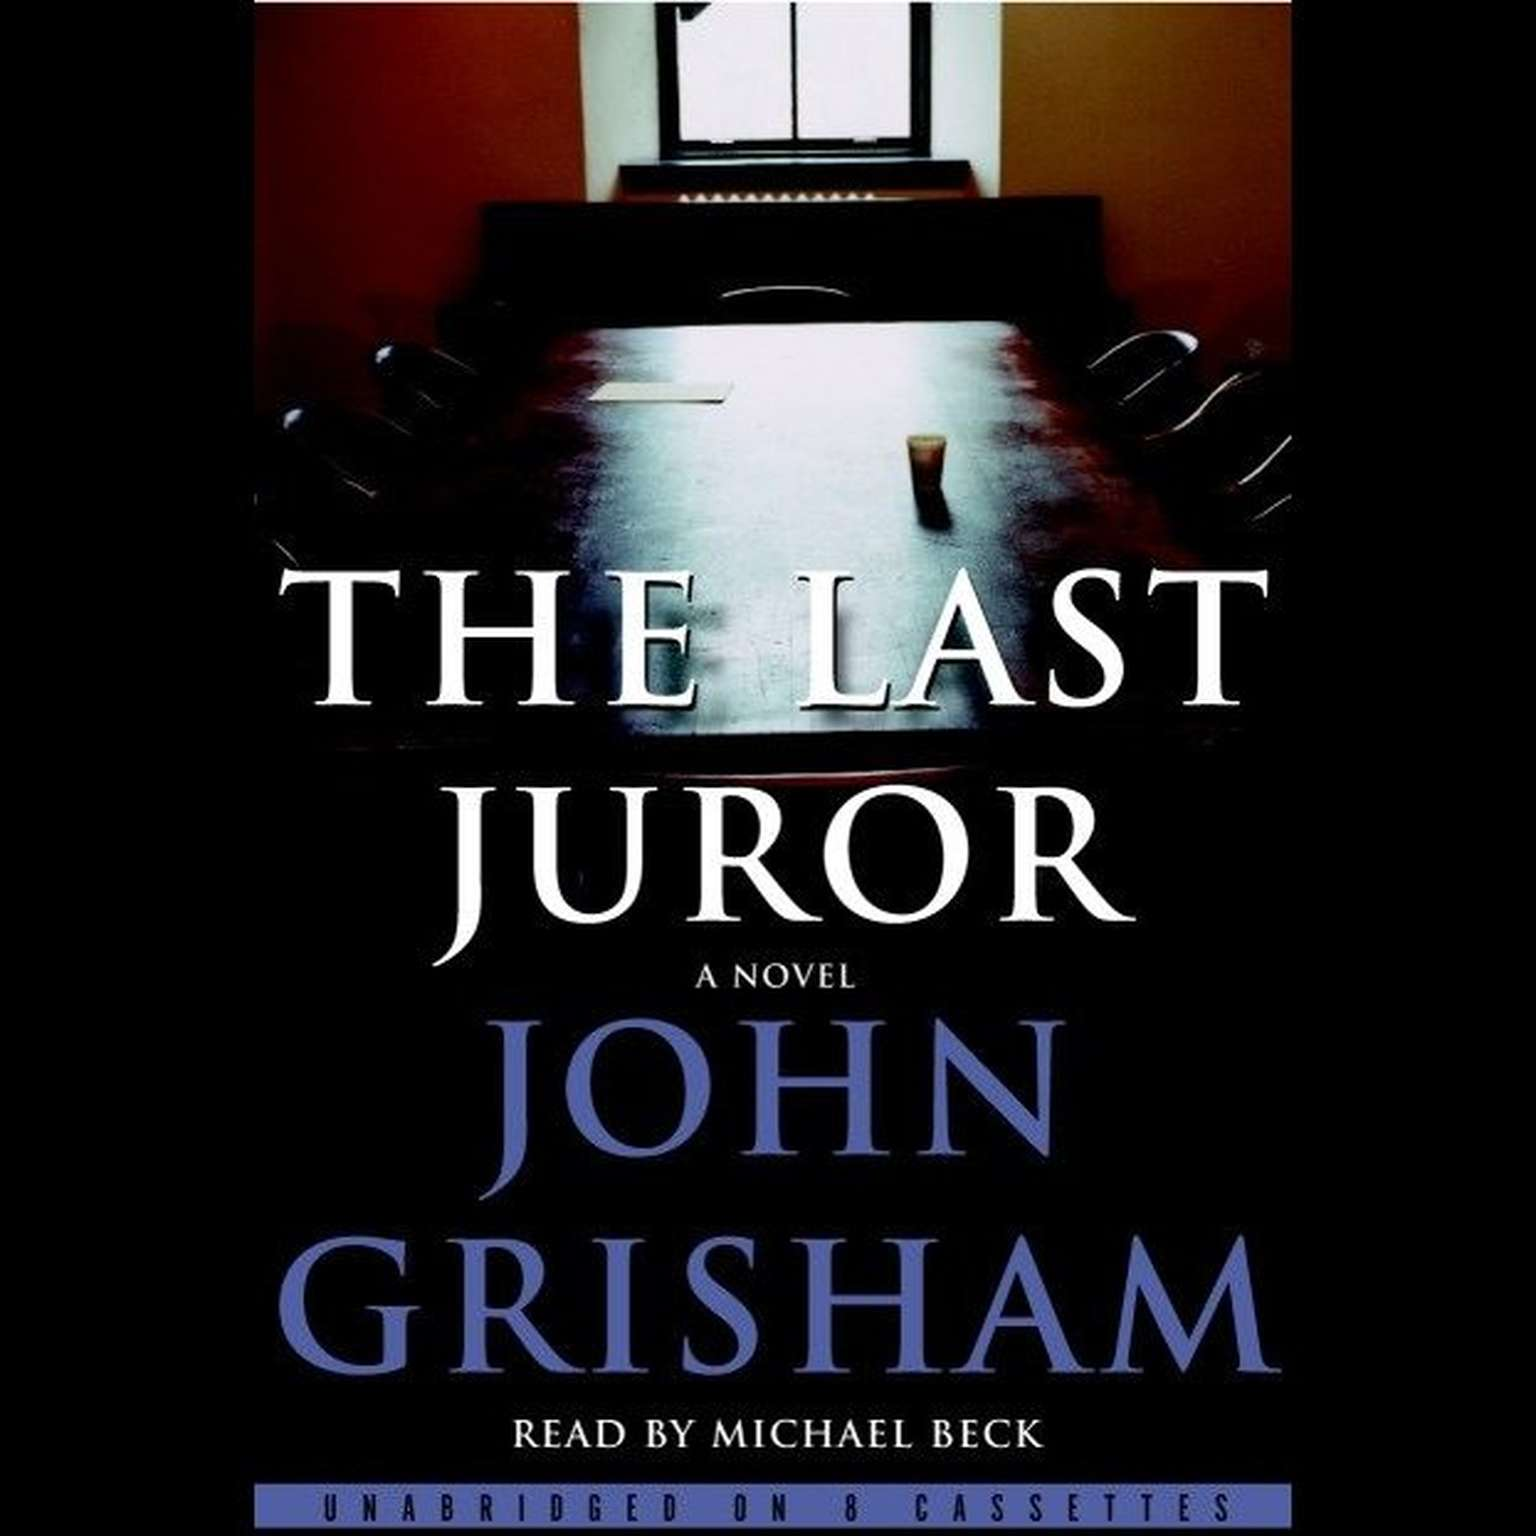 The Last Juror: A Novel Audiobook, by John Grisham